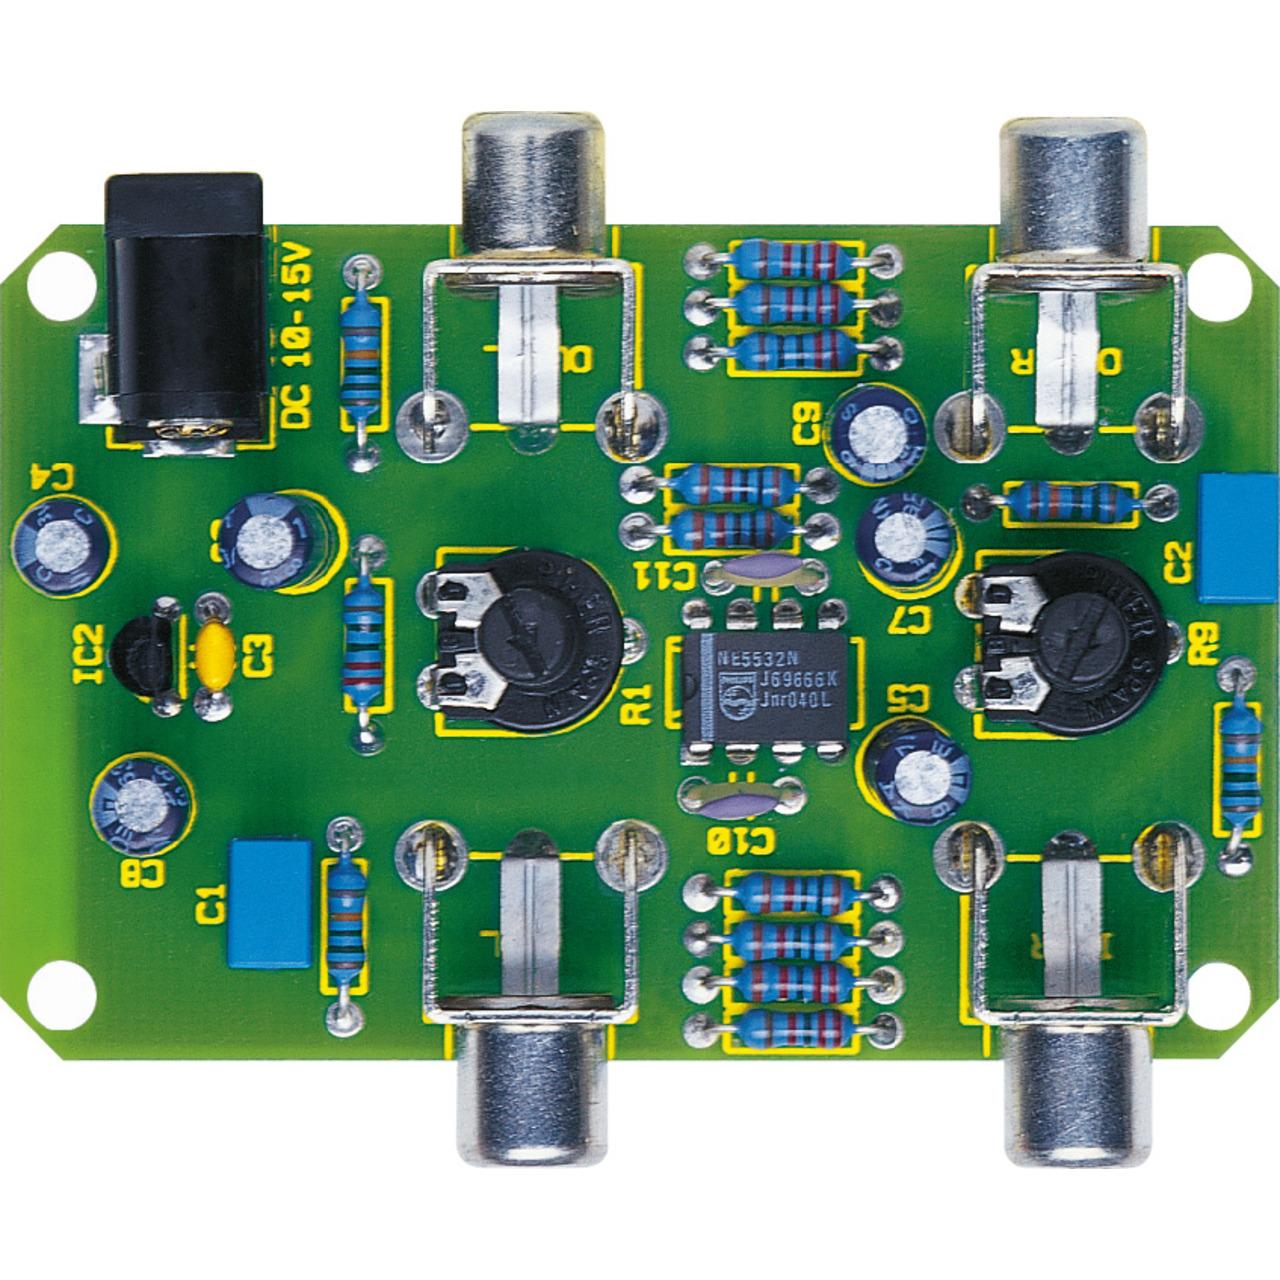 ELV Bausatz Aufhol-Verstärker AHV 100- ohne Gehäuse